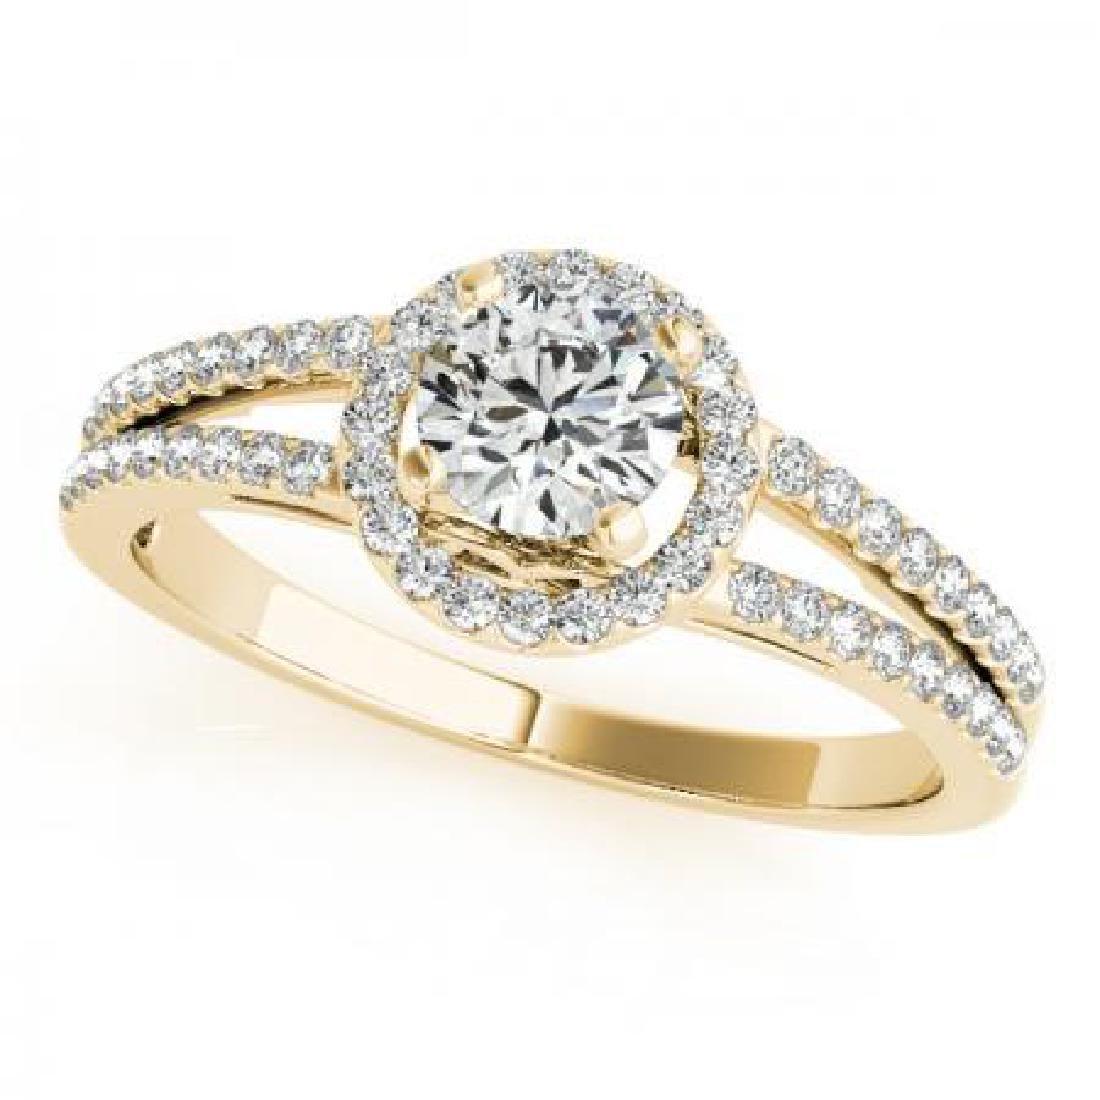 CERTIFIED 18K YELLOW GOLD .95 CT G-H/VS-SI1 DIAMOND HAL